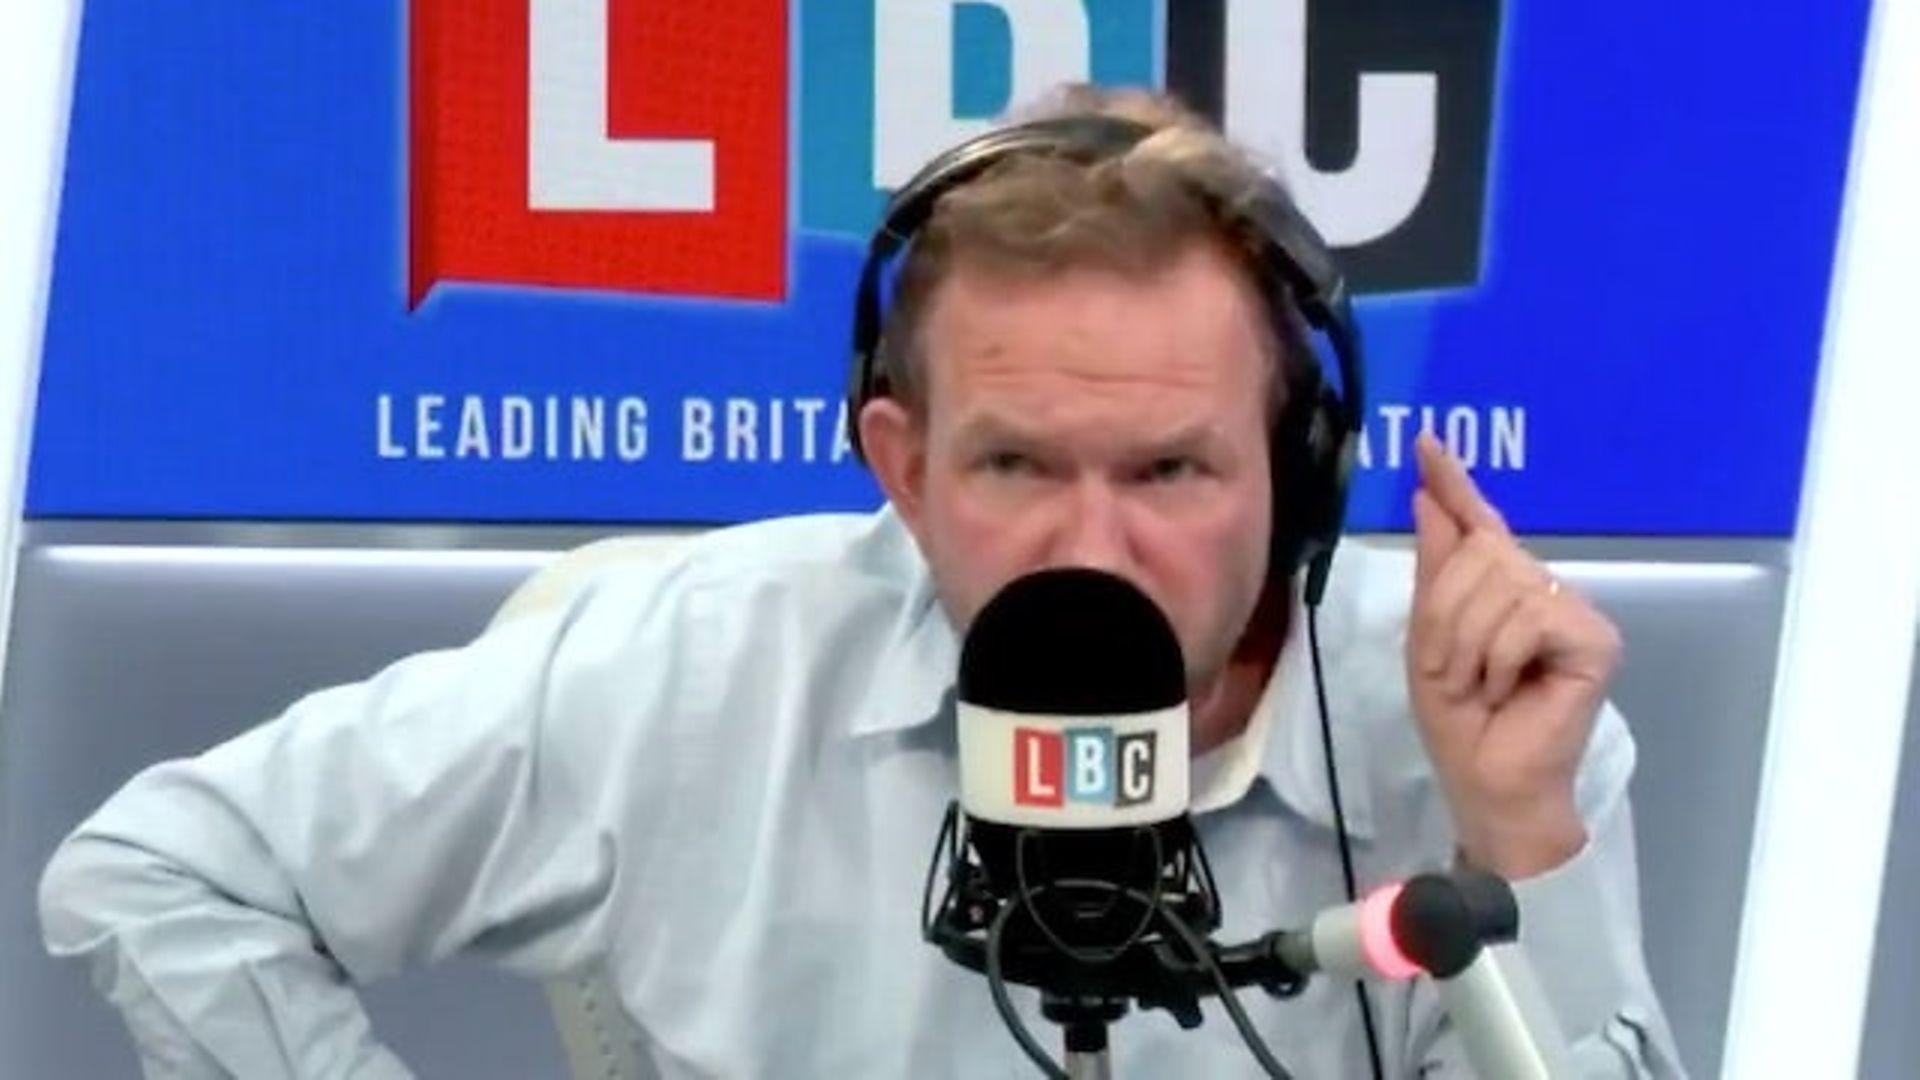 James O'Brien on LBC Radio - Credit: LBC/Global